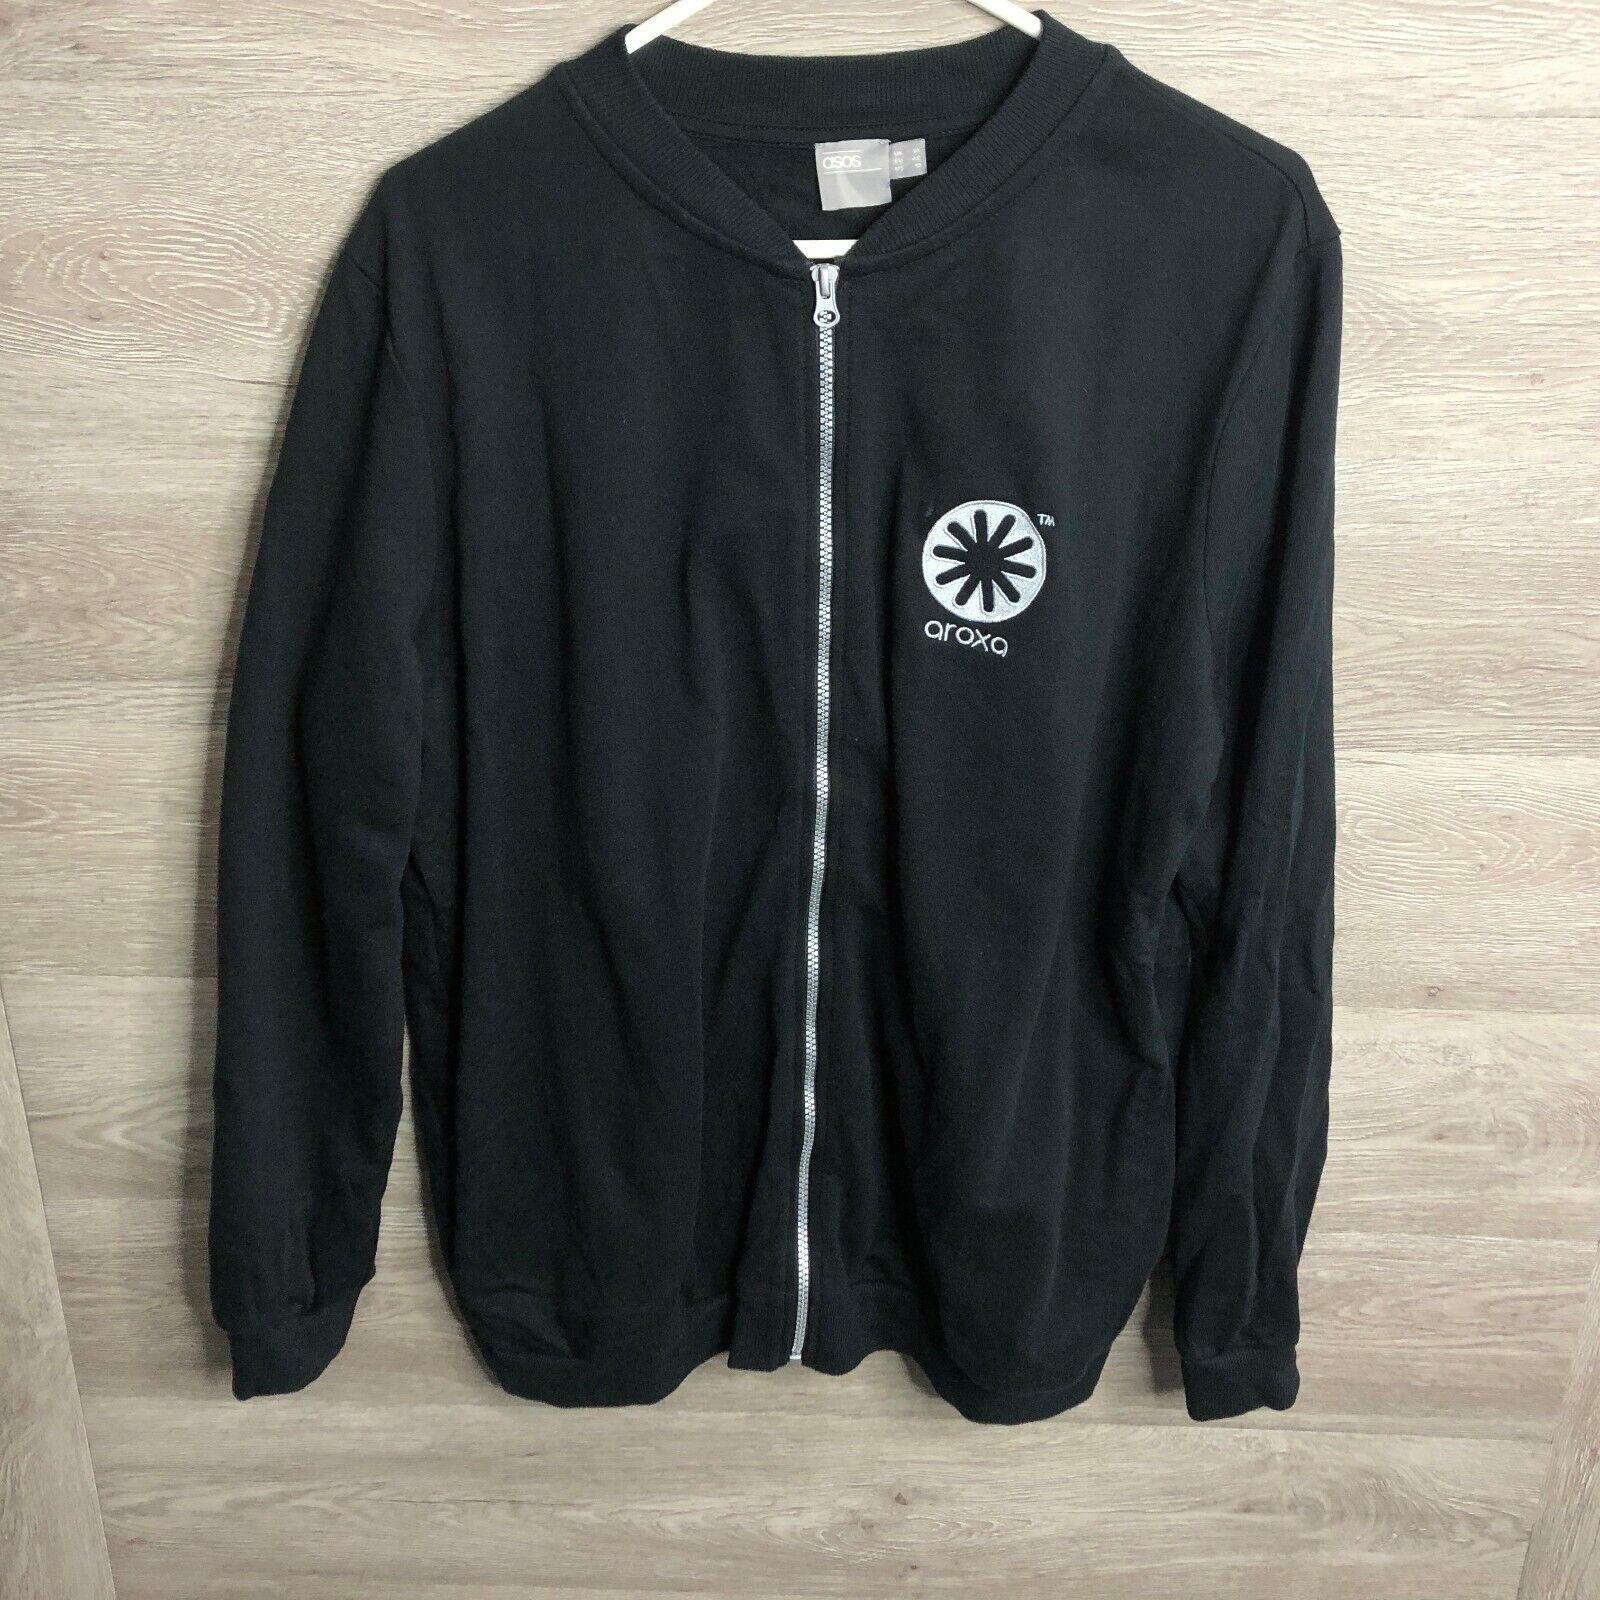 Asos Womens Size 10 Black Full Zip Jacket Top Varsity NEW